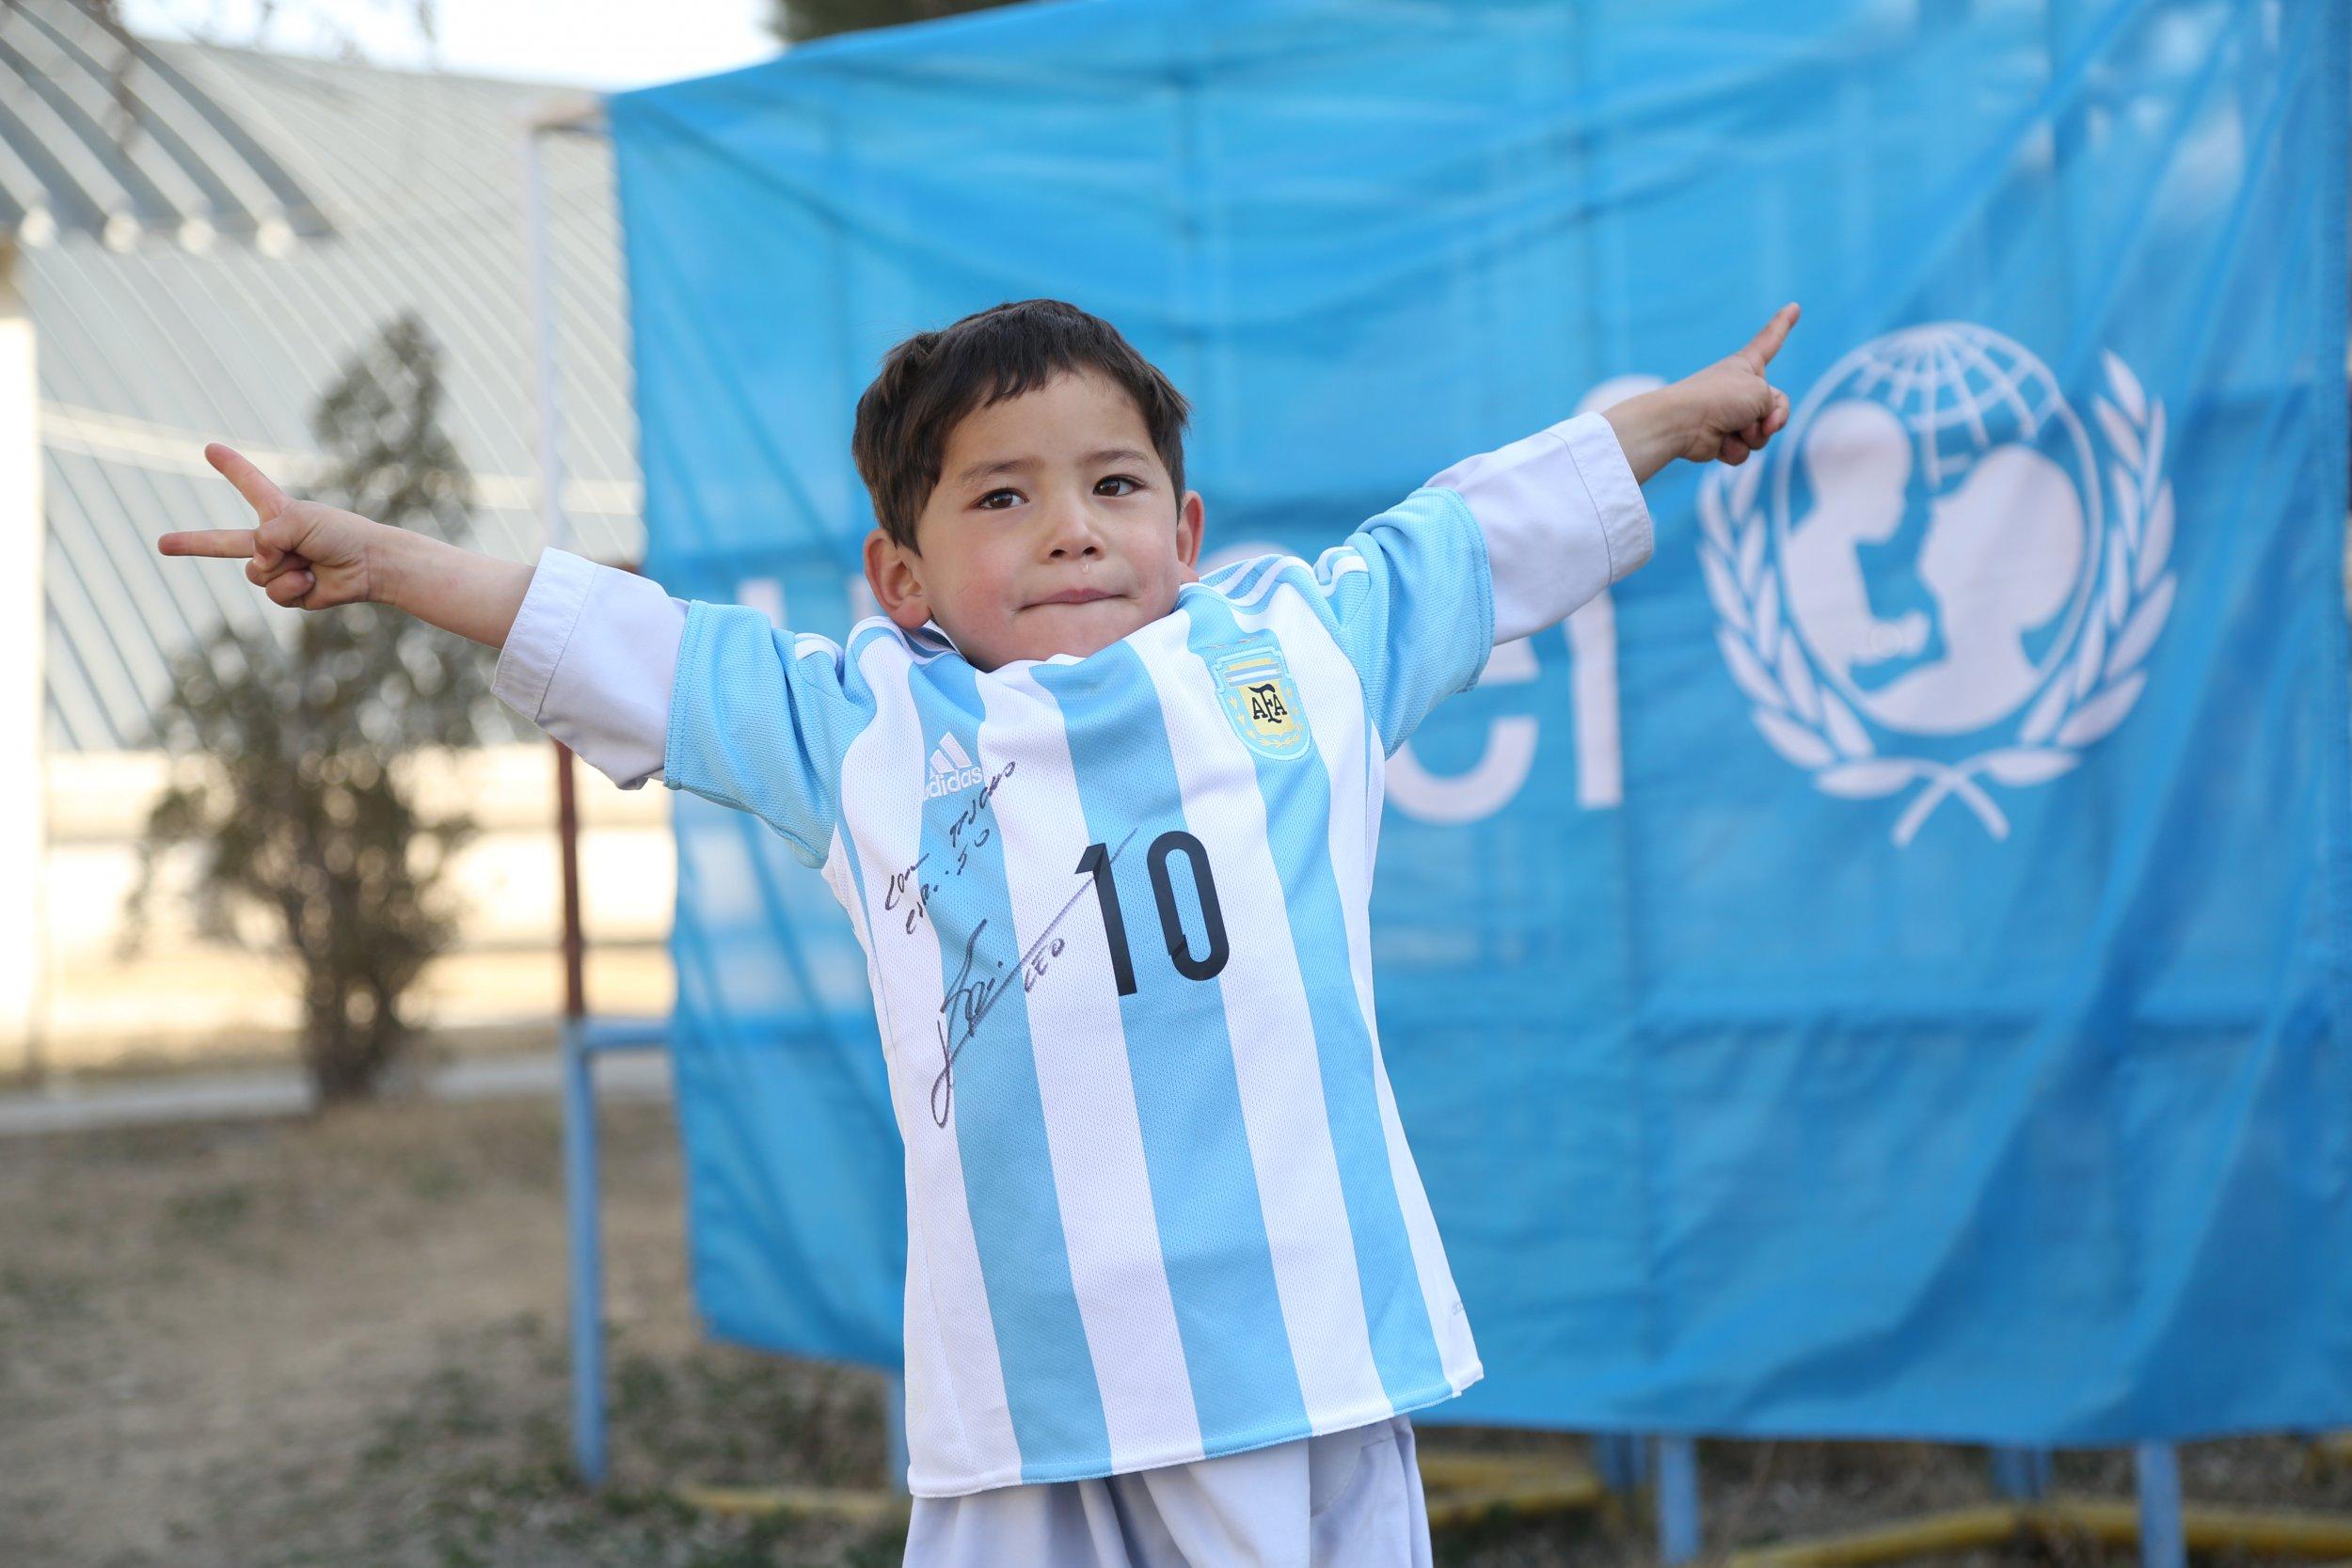 messi shirt afghan boy_0225